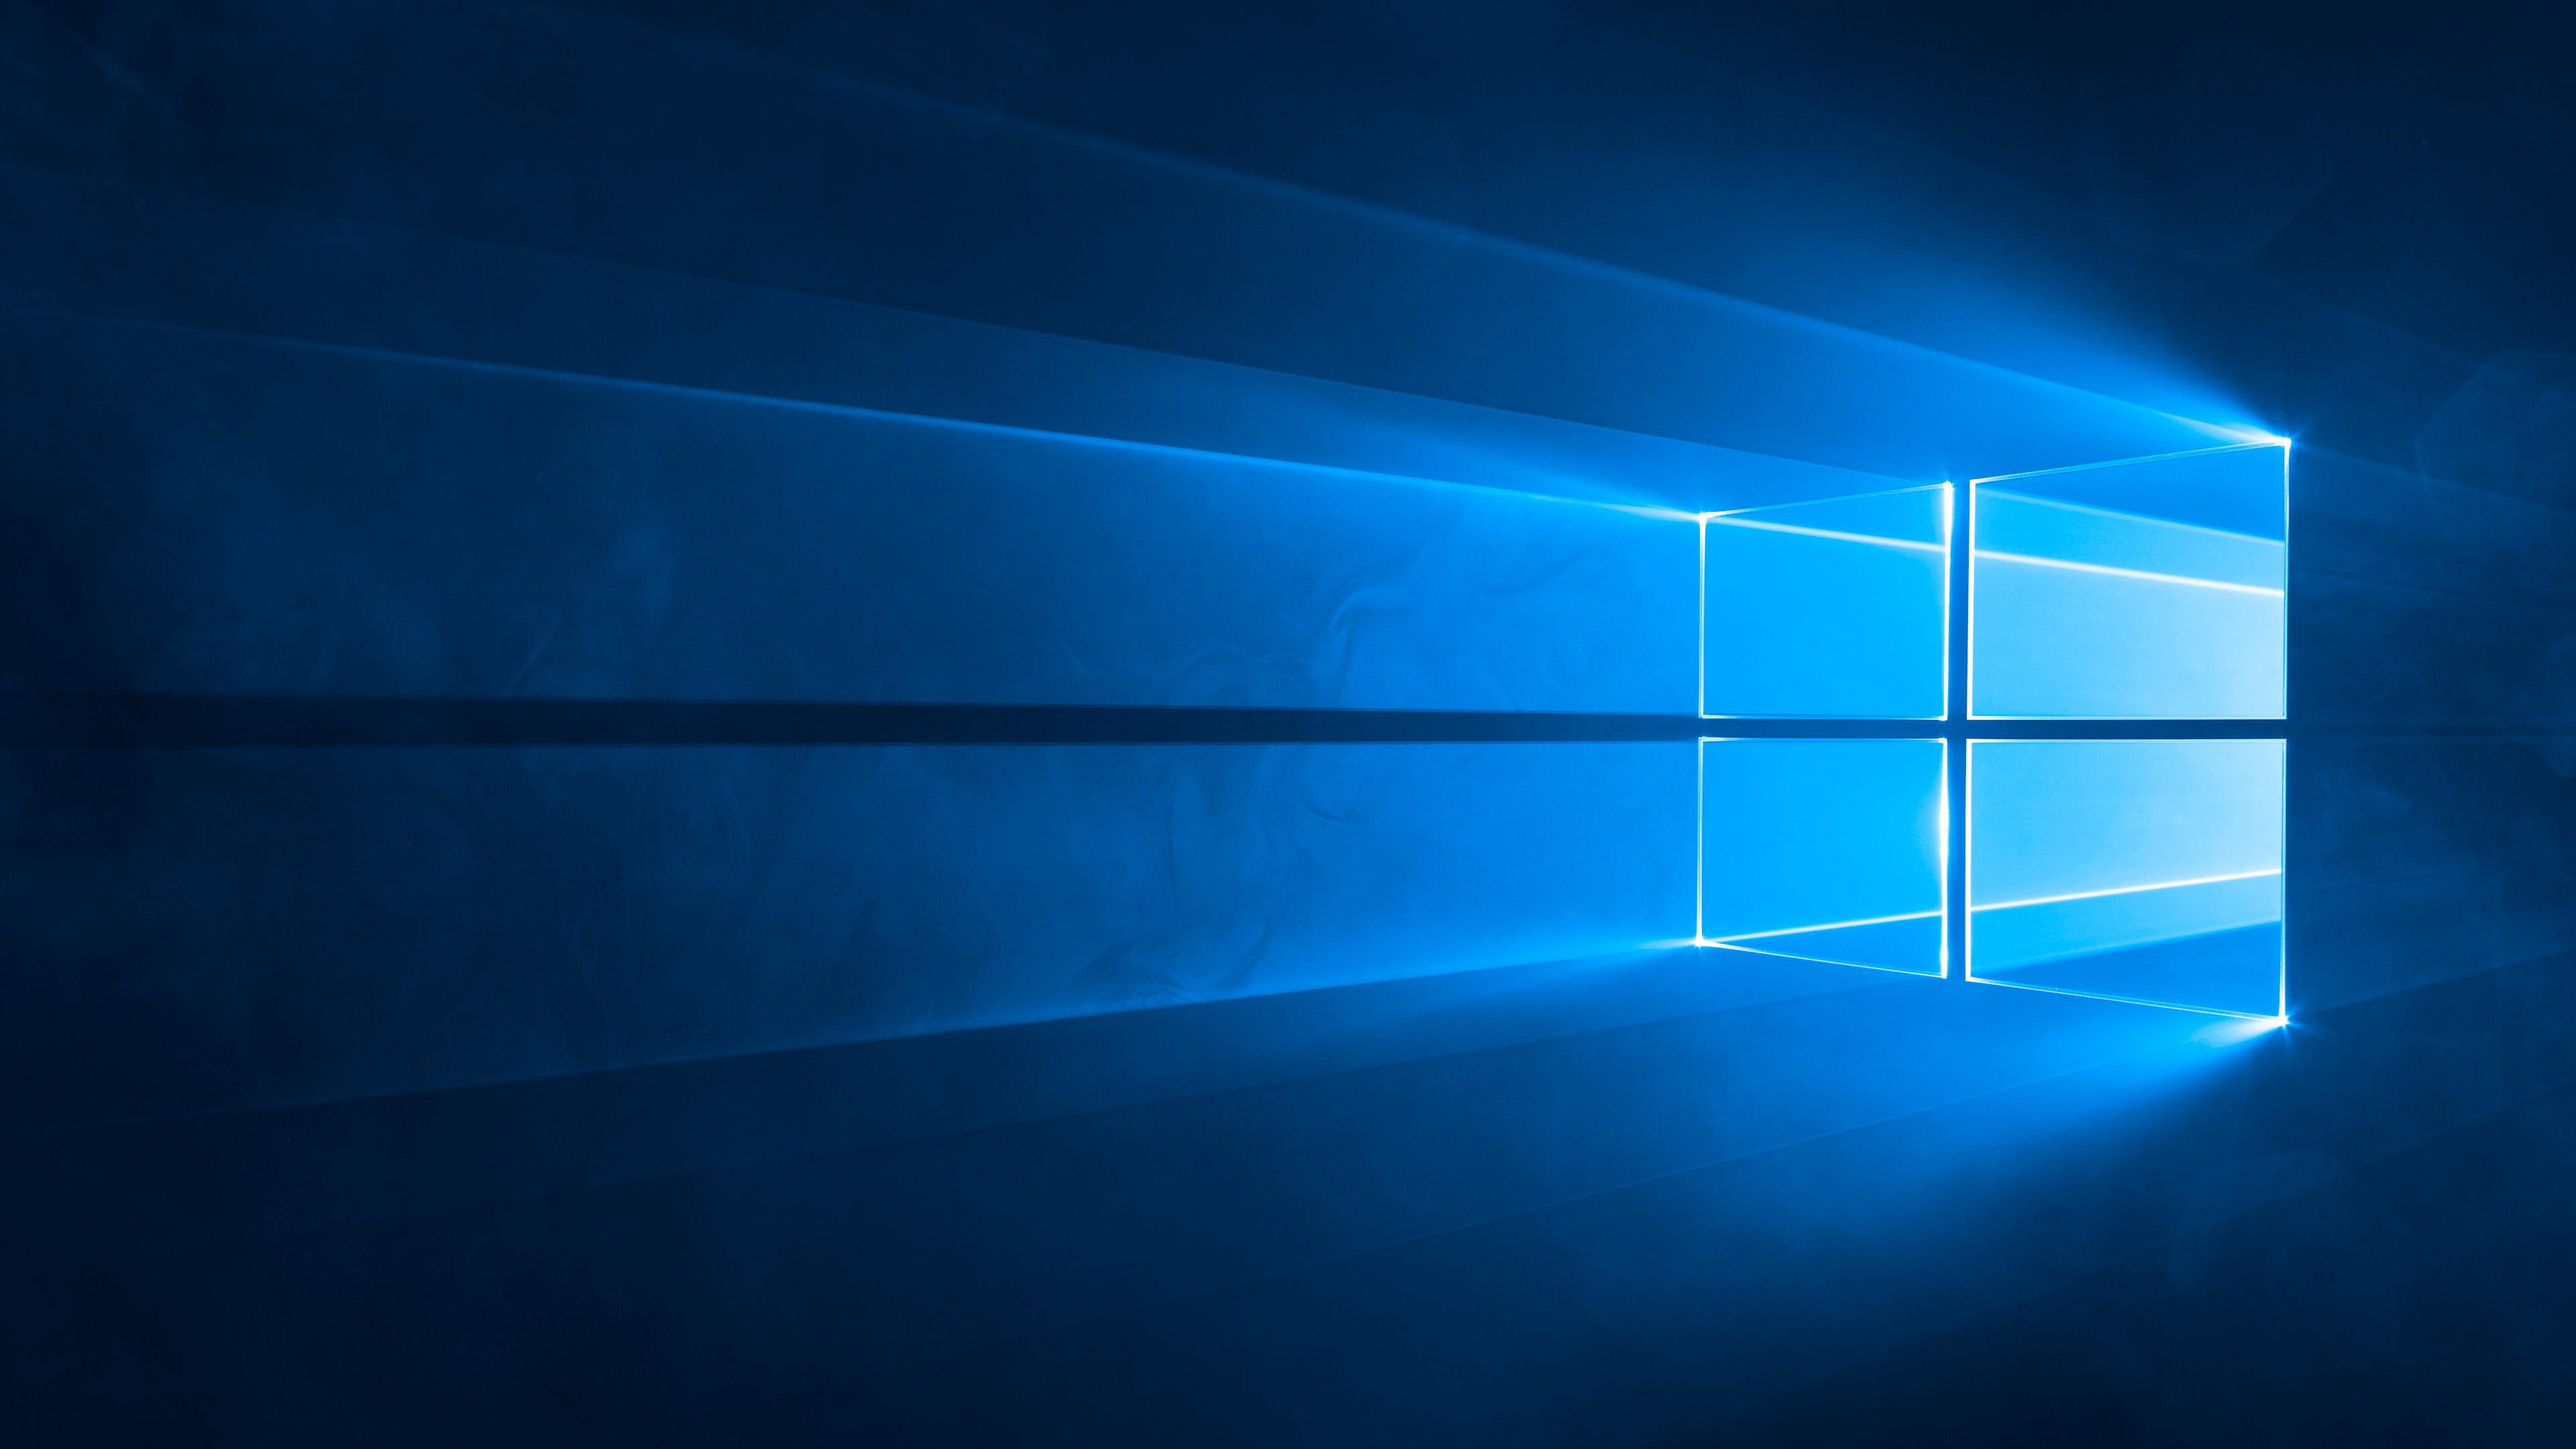 Windows 10 4K Wallpapers - Ultra HD Top 15 | AxeeTech